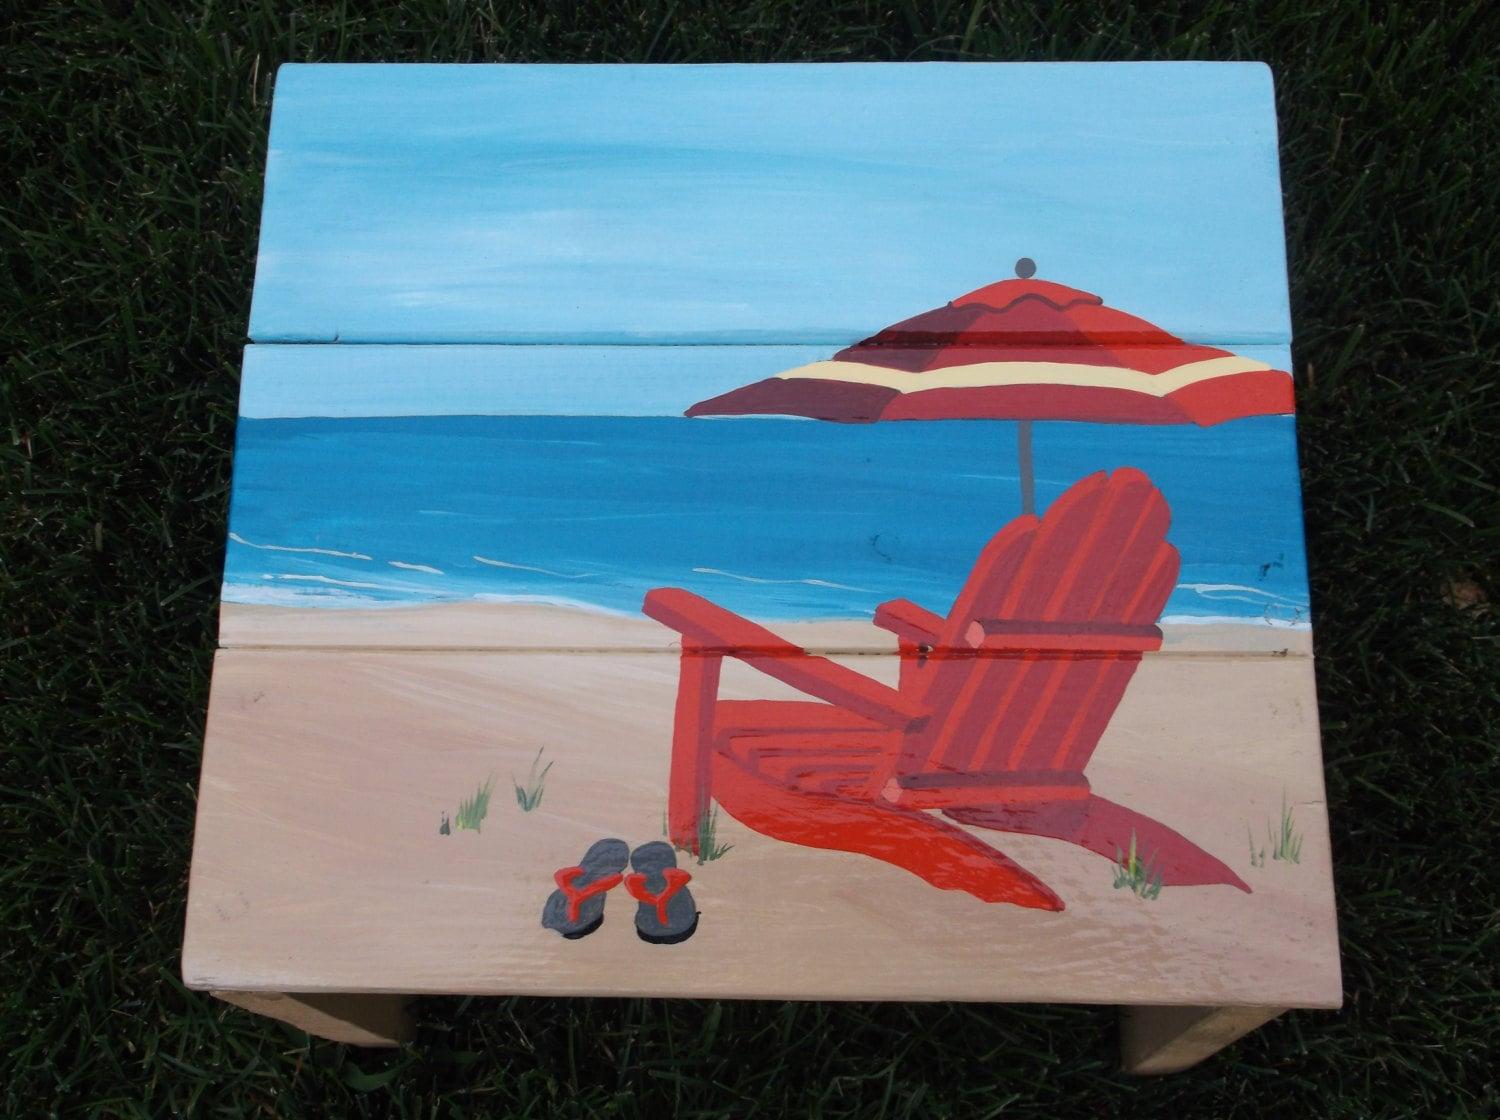 Adirondack Chair Umbrella and Flip Flop on the Beach Hand